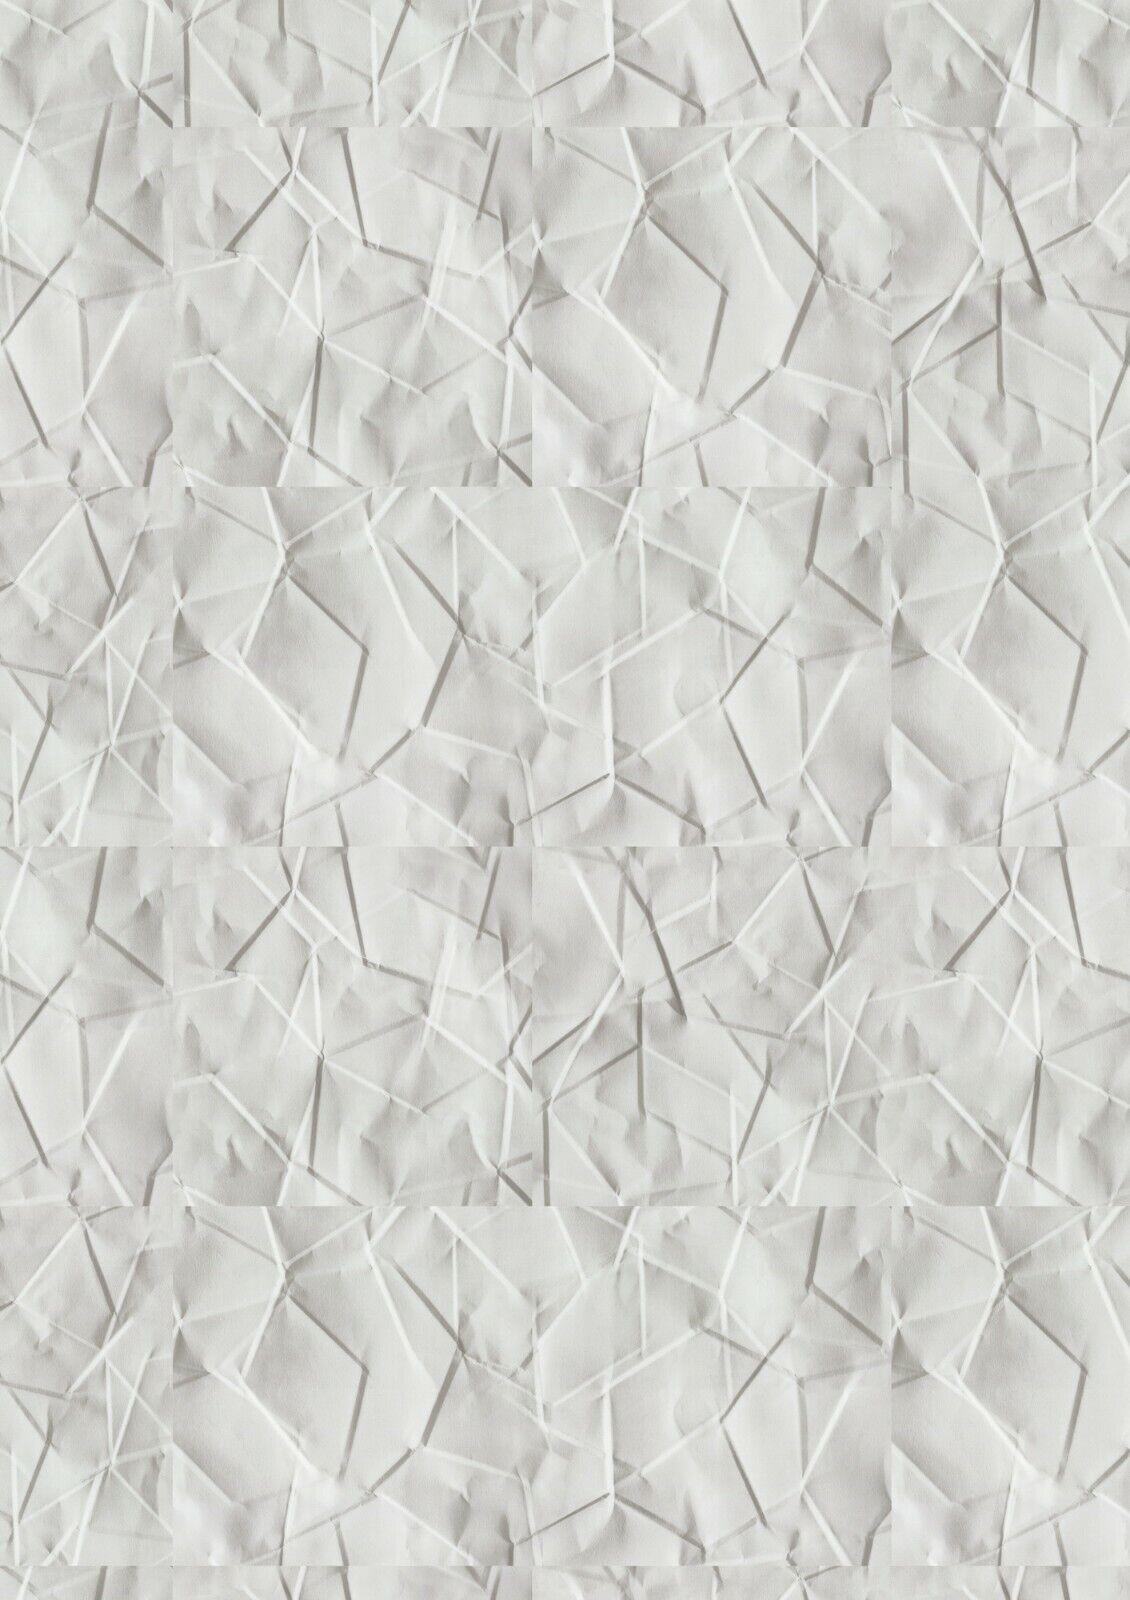 Objectflor Vinyl Designbelag Expona Commercial 5105 Crystal Parchment 3,34m² Pak